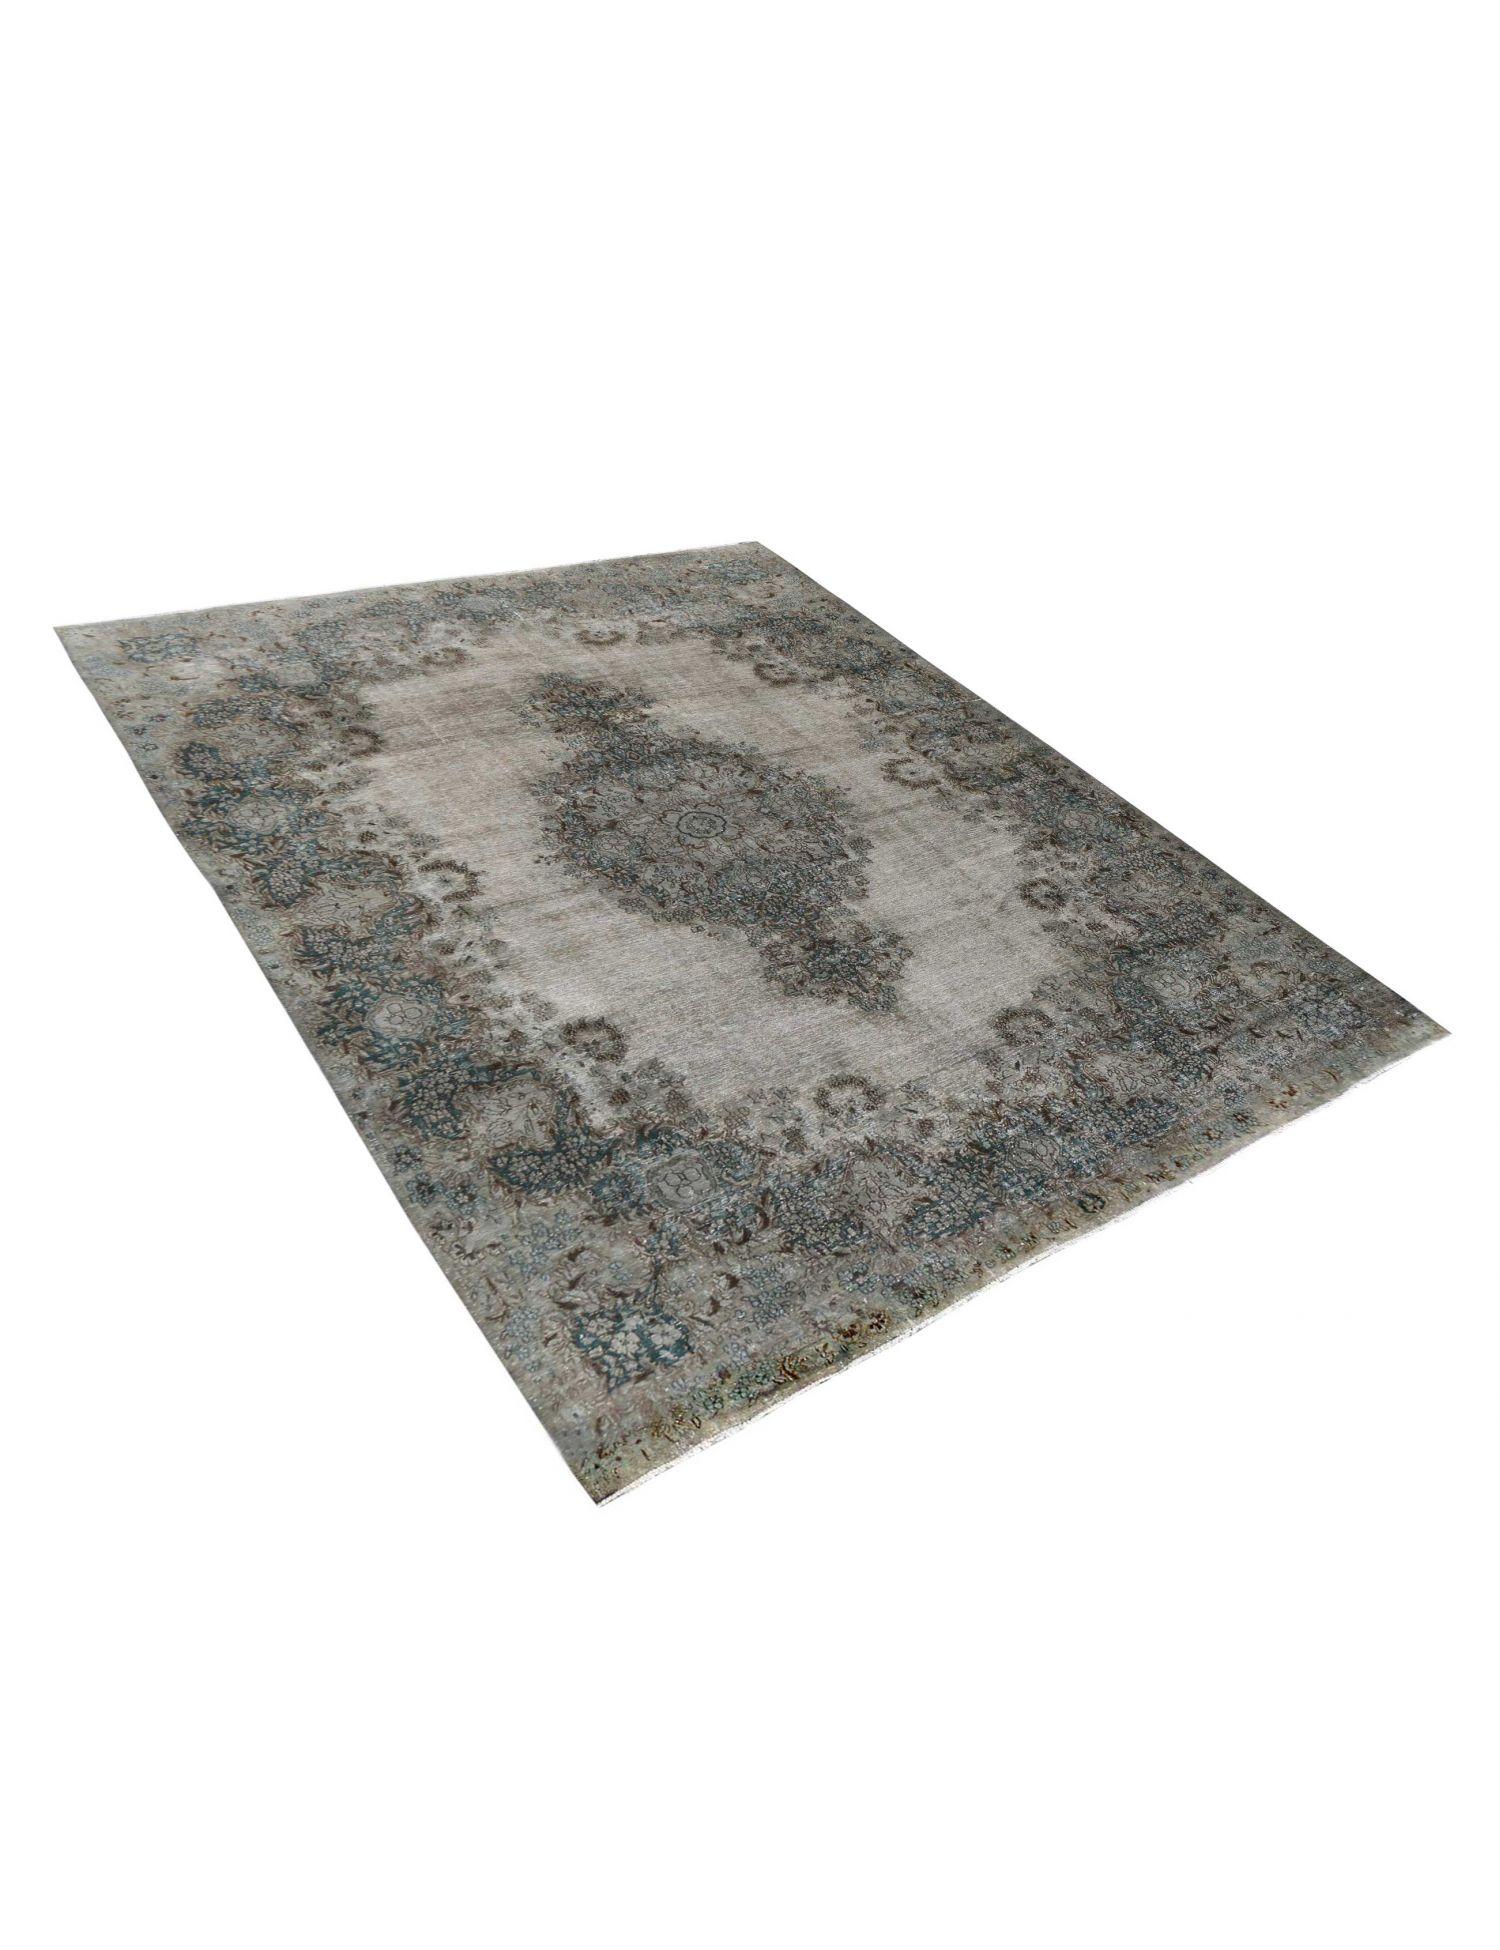 Vintage Perserteppich  grau <br/>423 x 296 cm